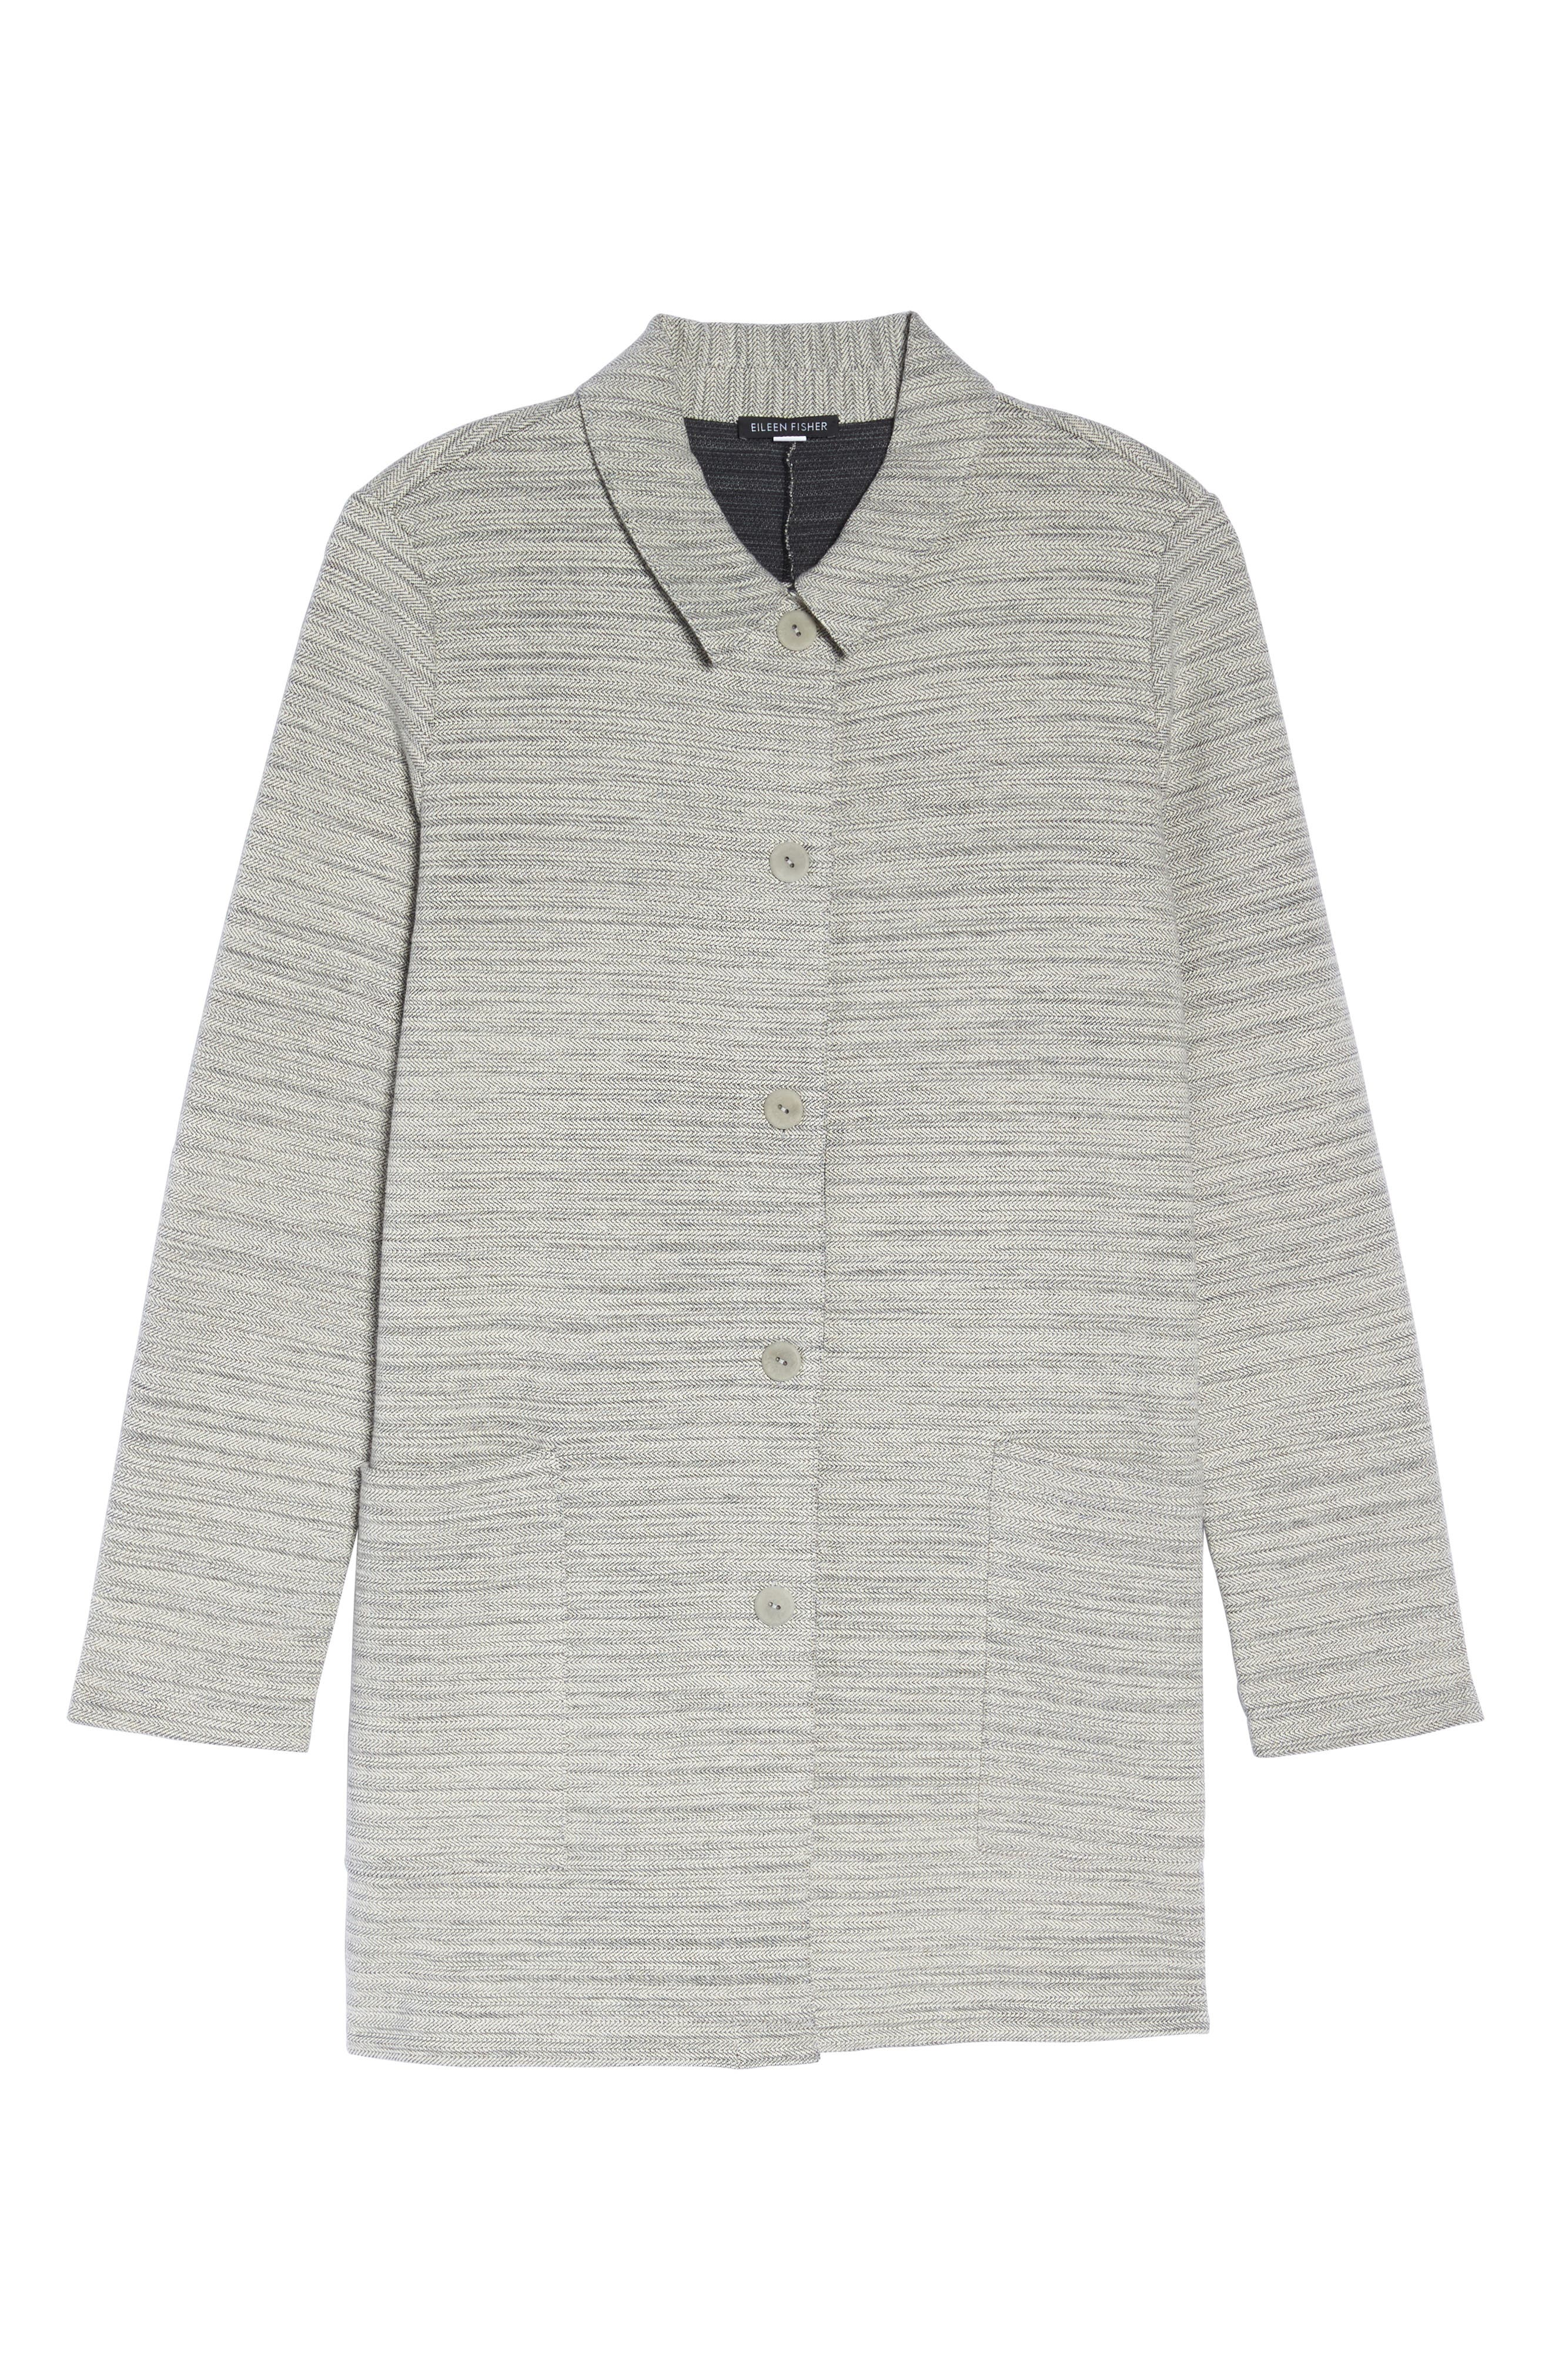 Cotton Blend Tweed Jacket,                             Alternate thumbnail 6, color,                             Dark Pearl